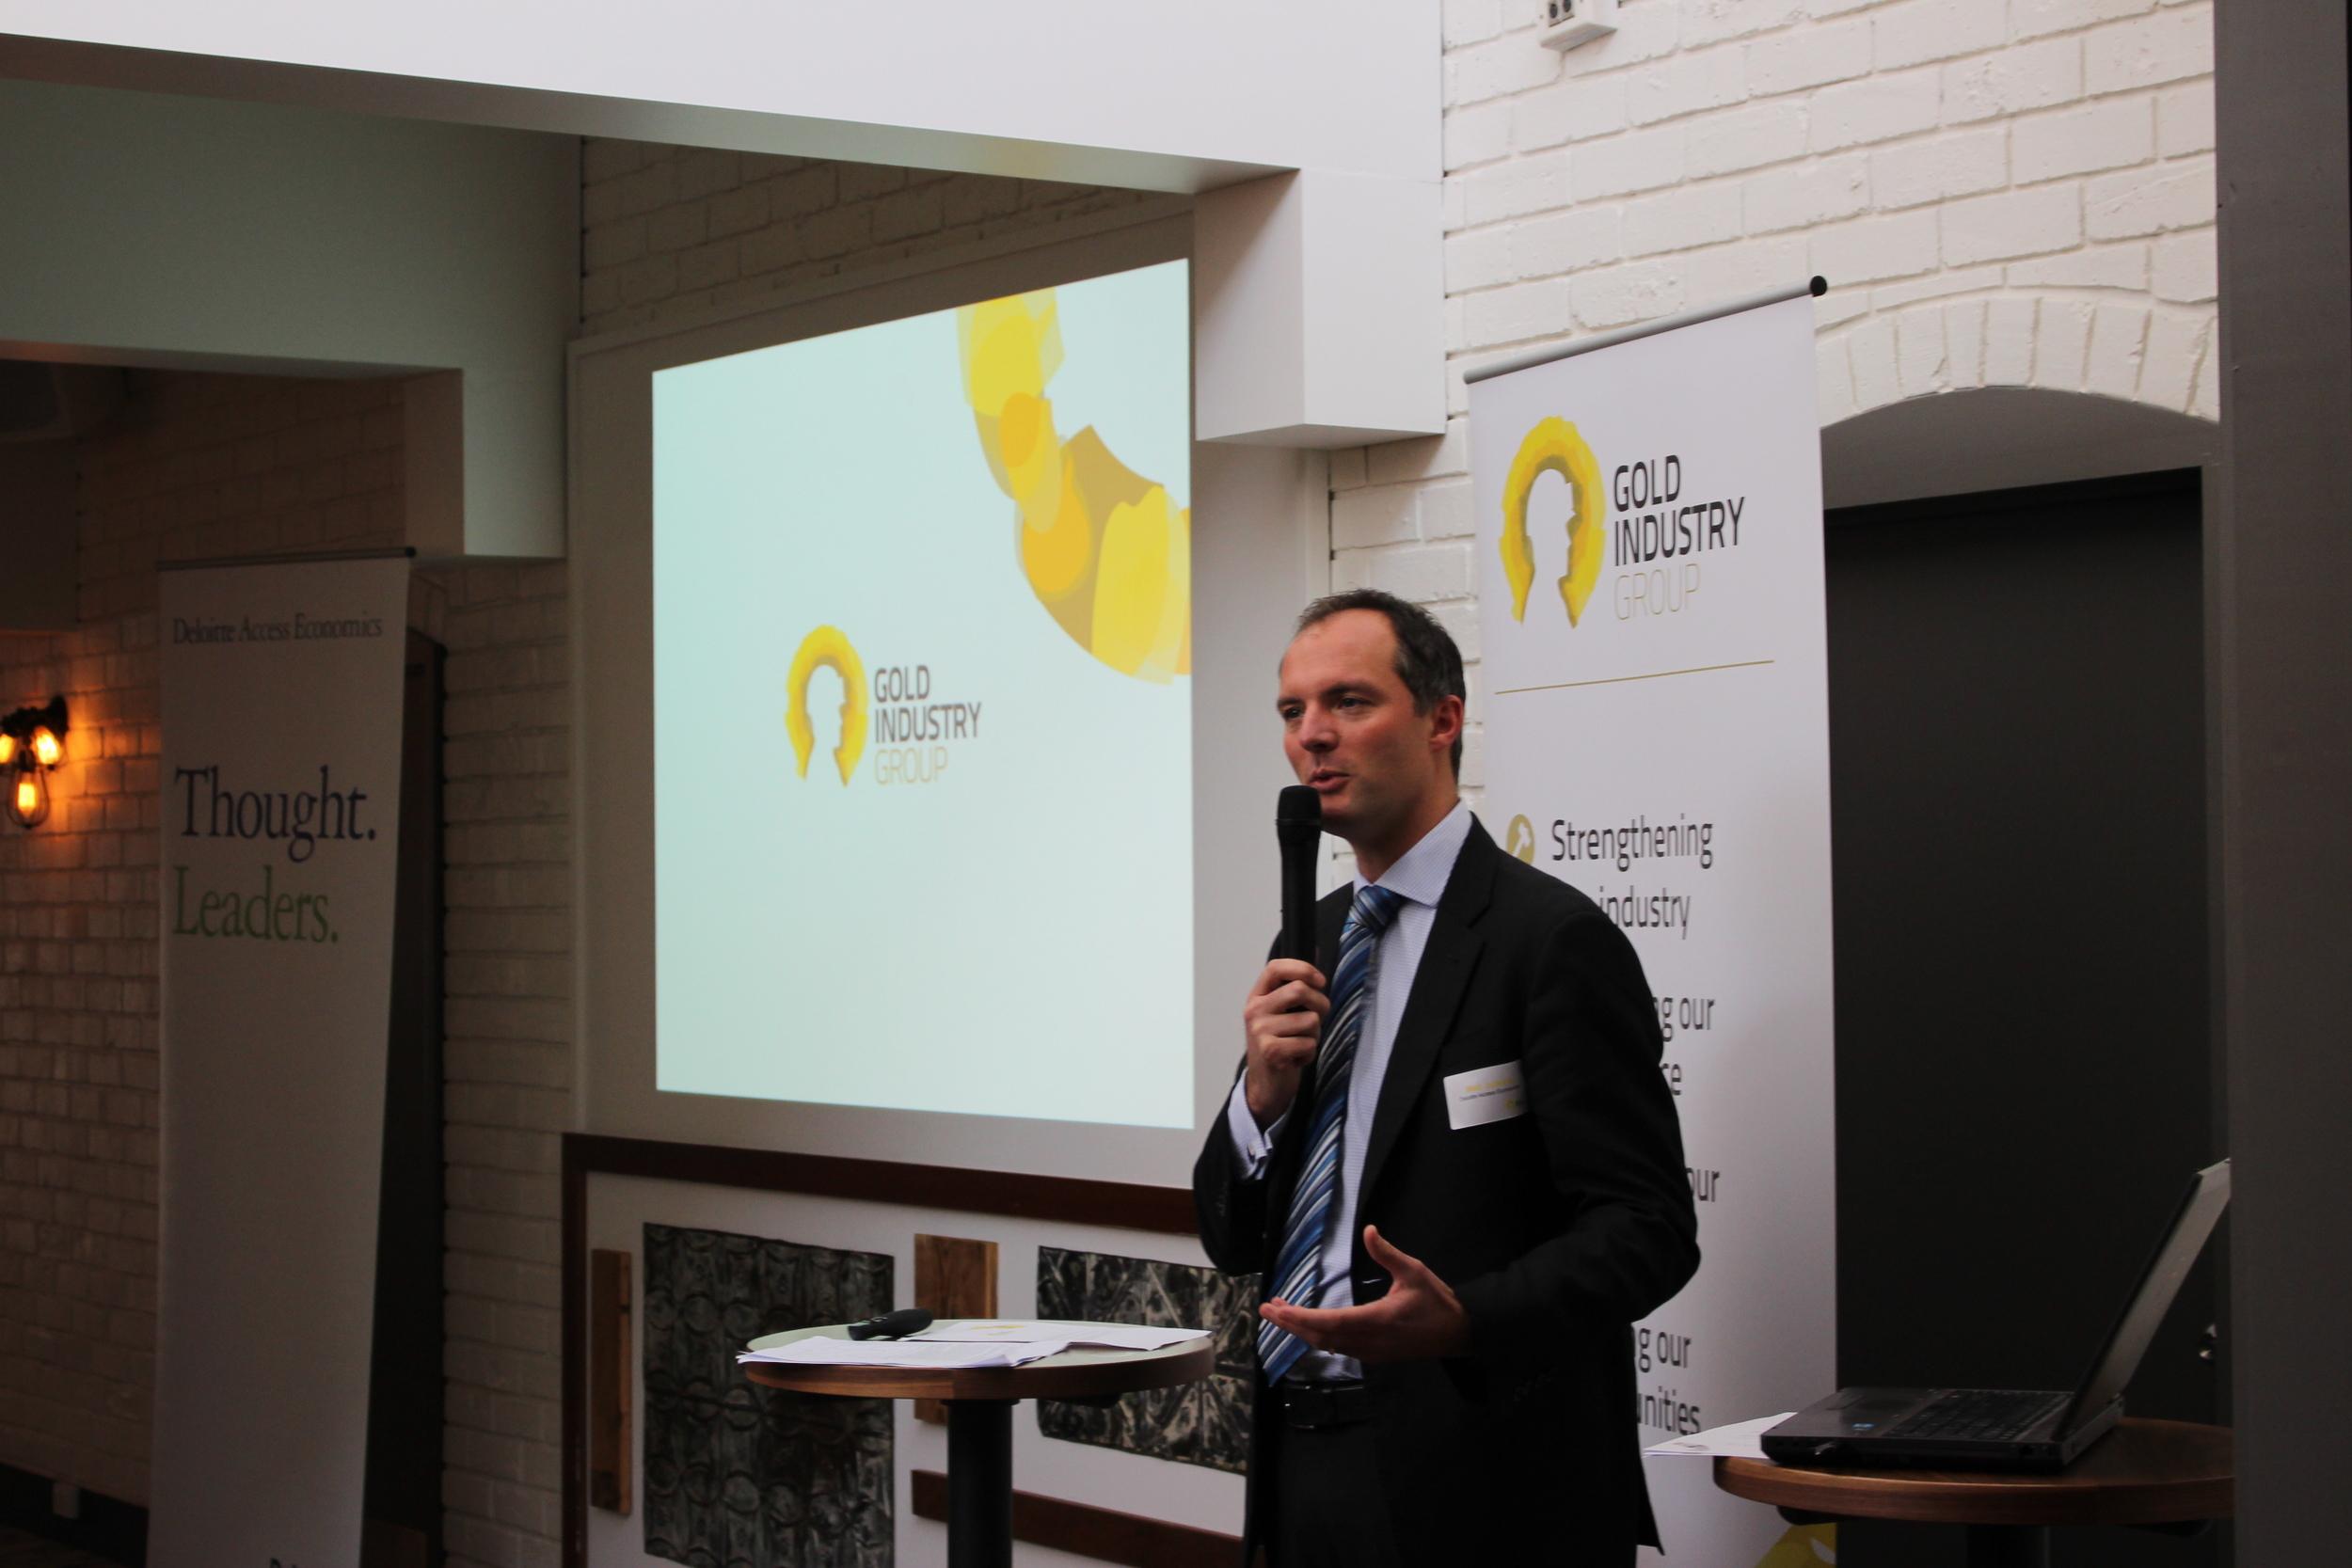 Deloitte Access Economics Partner Matt Judkins presenting a market update at the launch